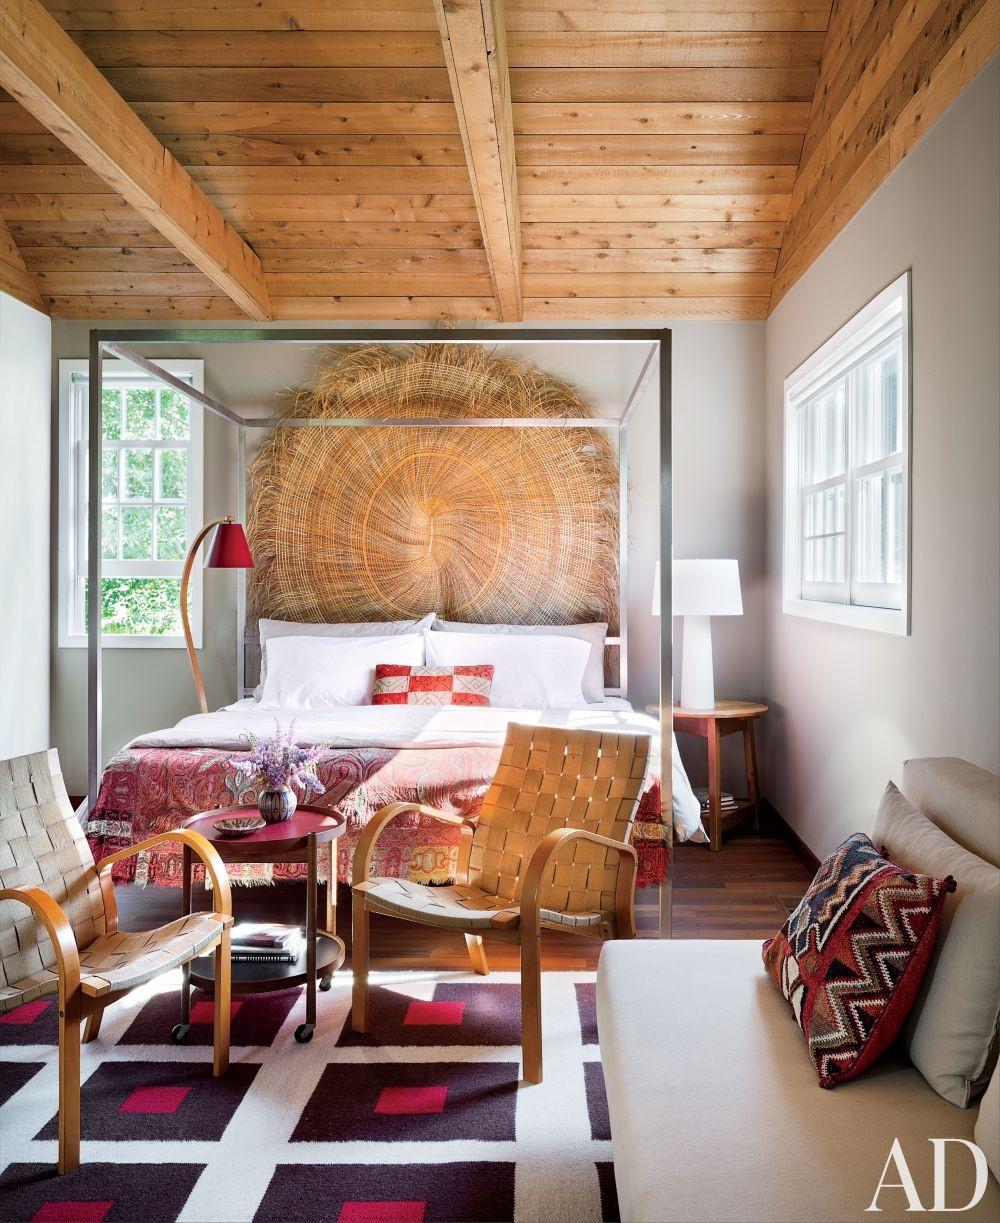 Modern Bedroom and Christoff:Finio Architecture in Sagaponack, New York